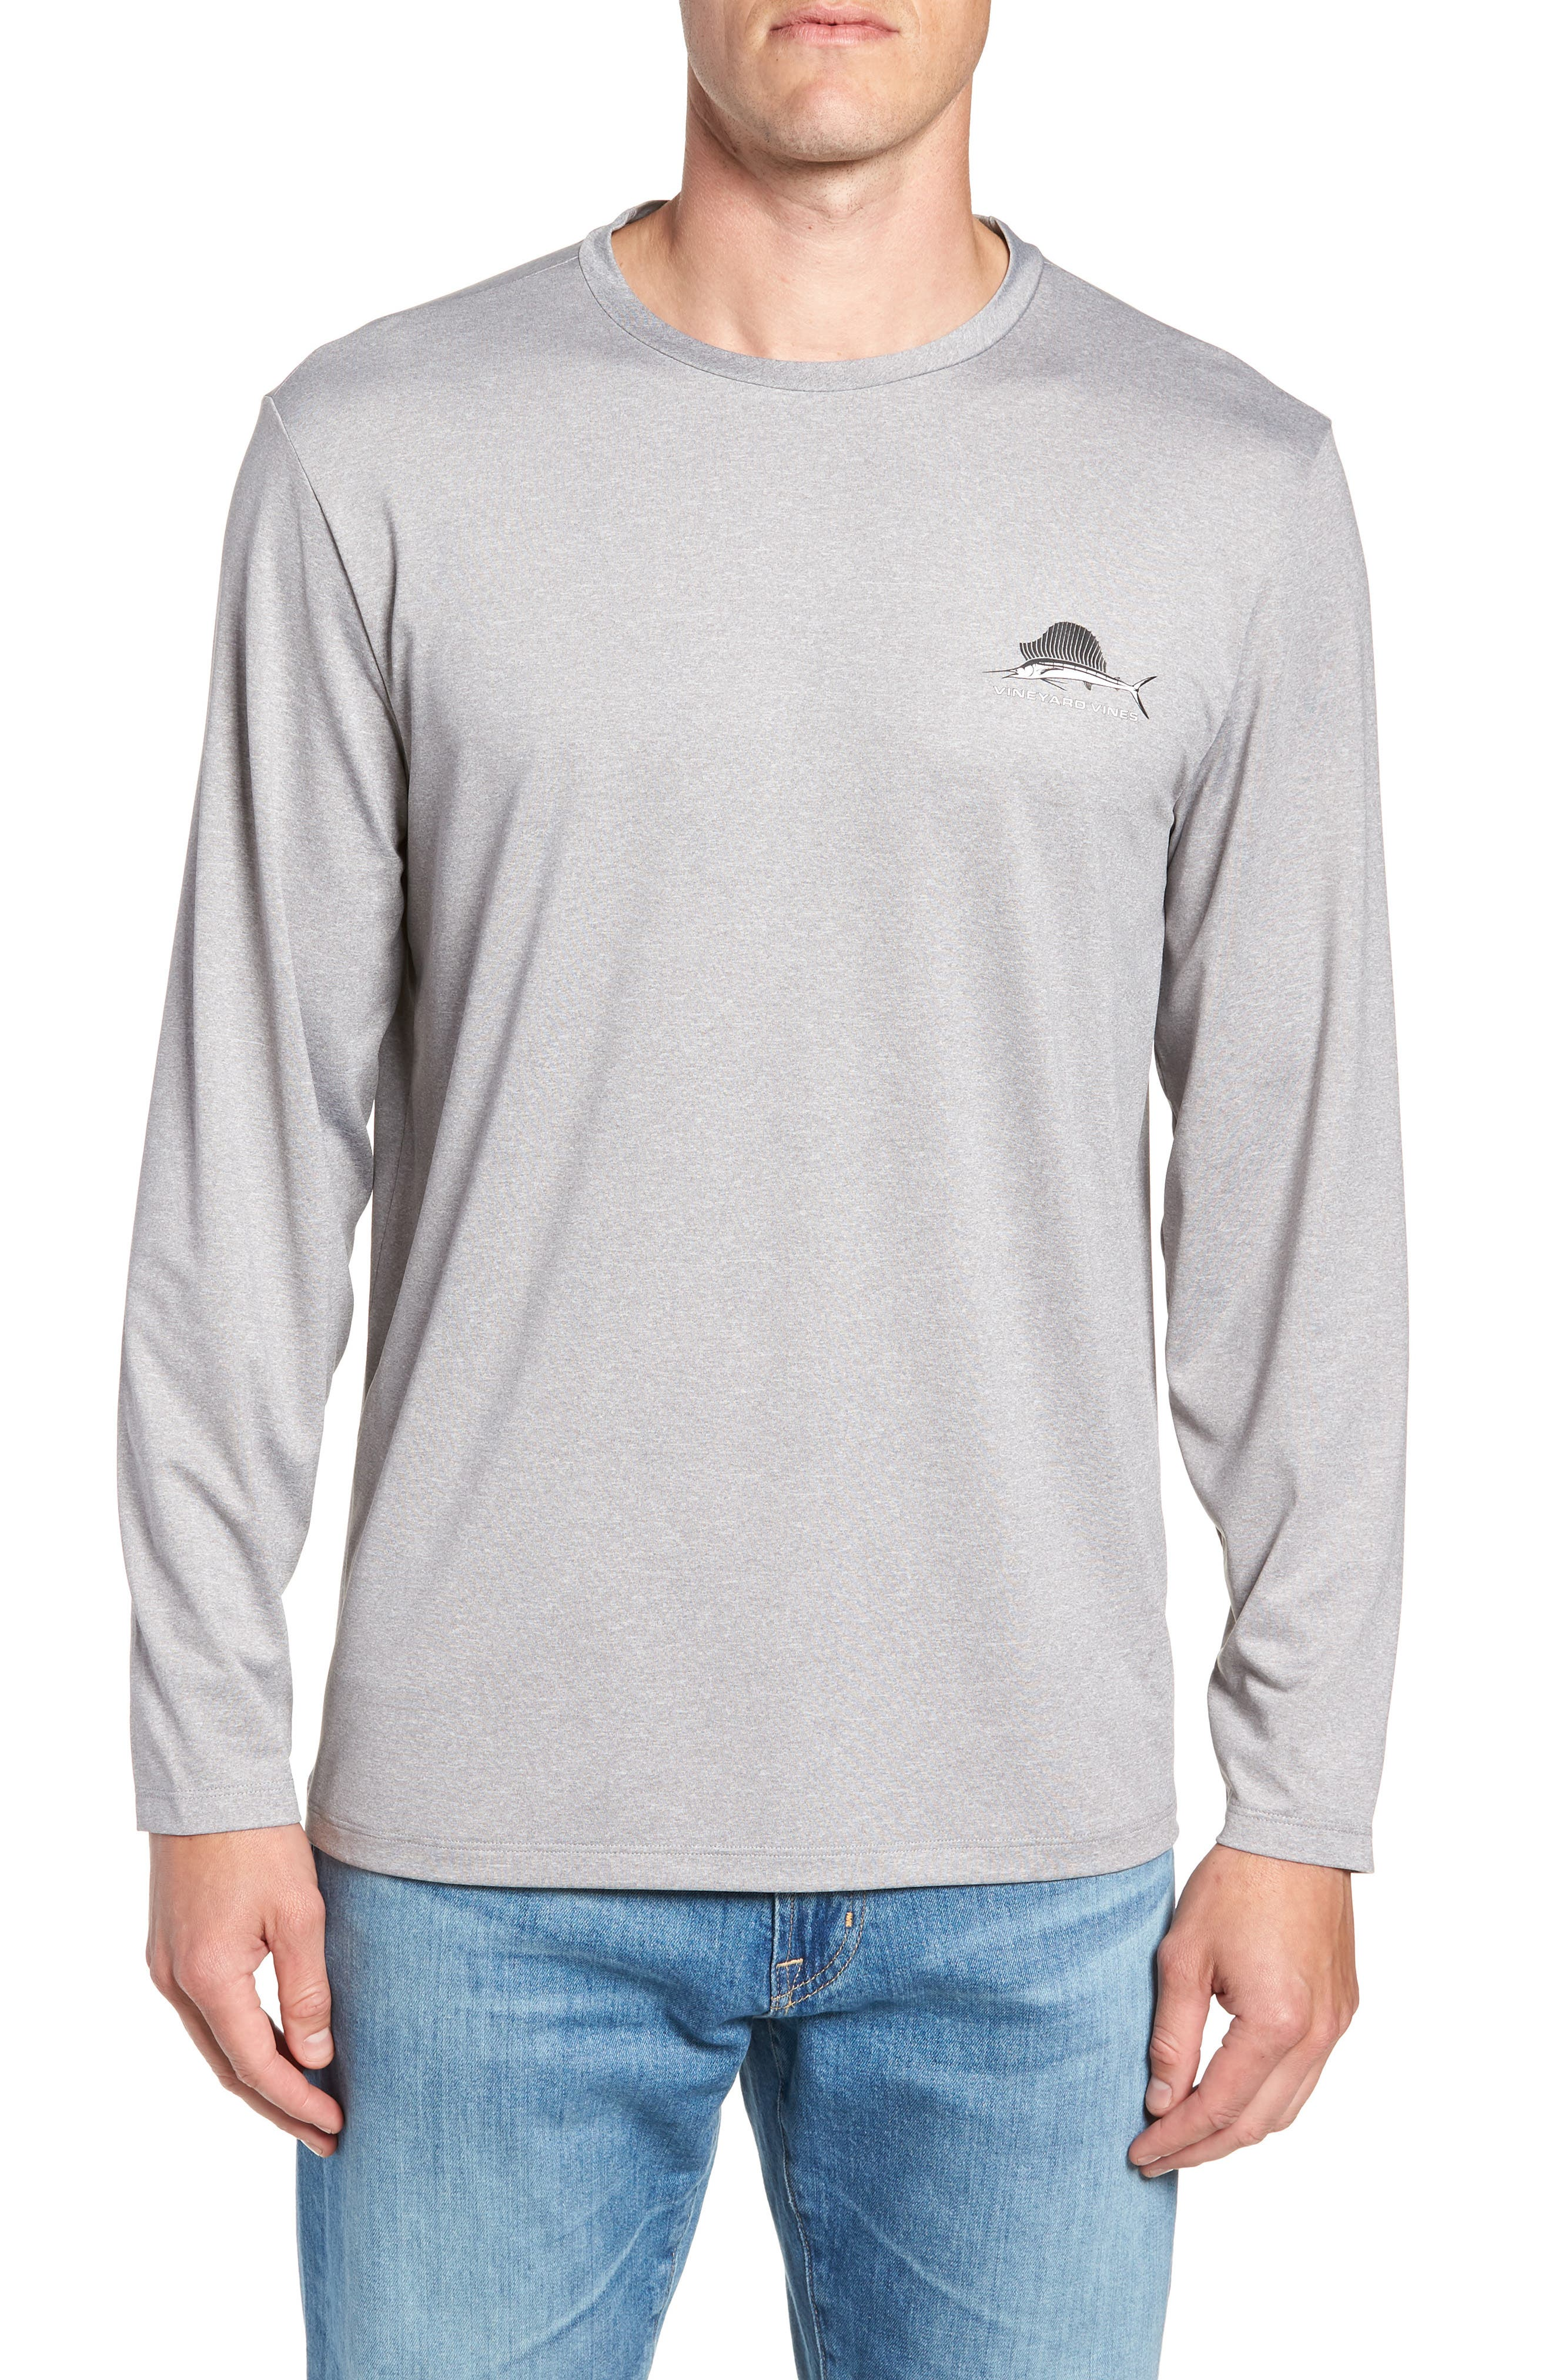 Sailfish Logo Performance T-Shirt,                         Main,                         color, 039